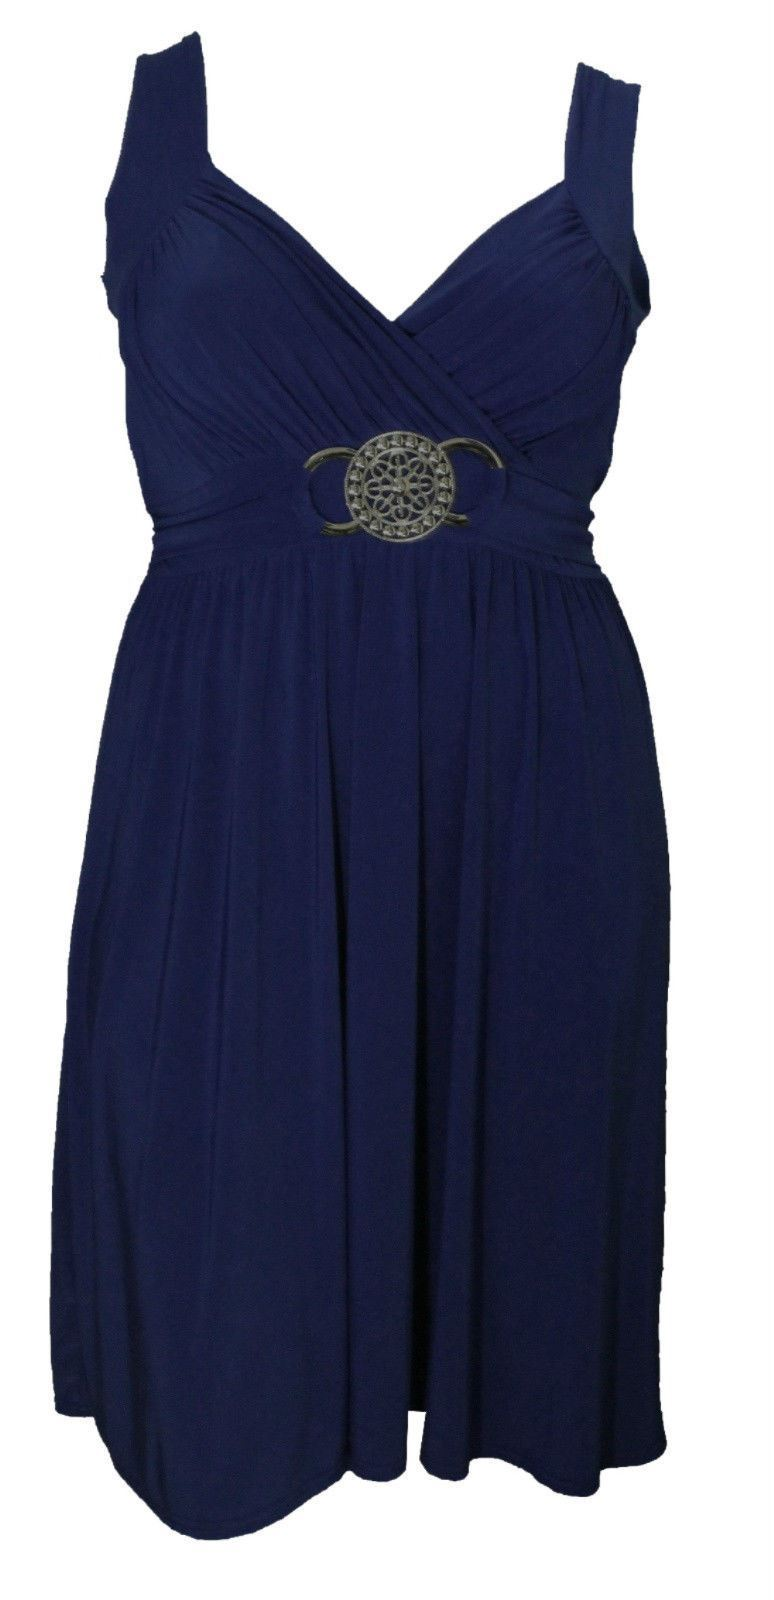 Original New Prom Dresses 4 Short Styles Prom Dress Women Prom Dresses Short